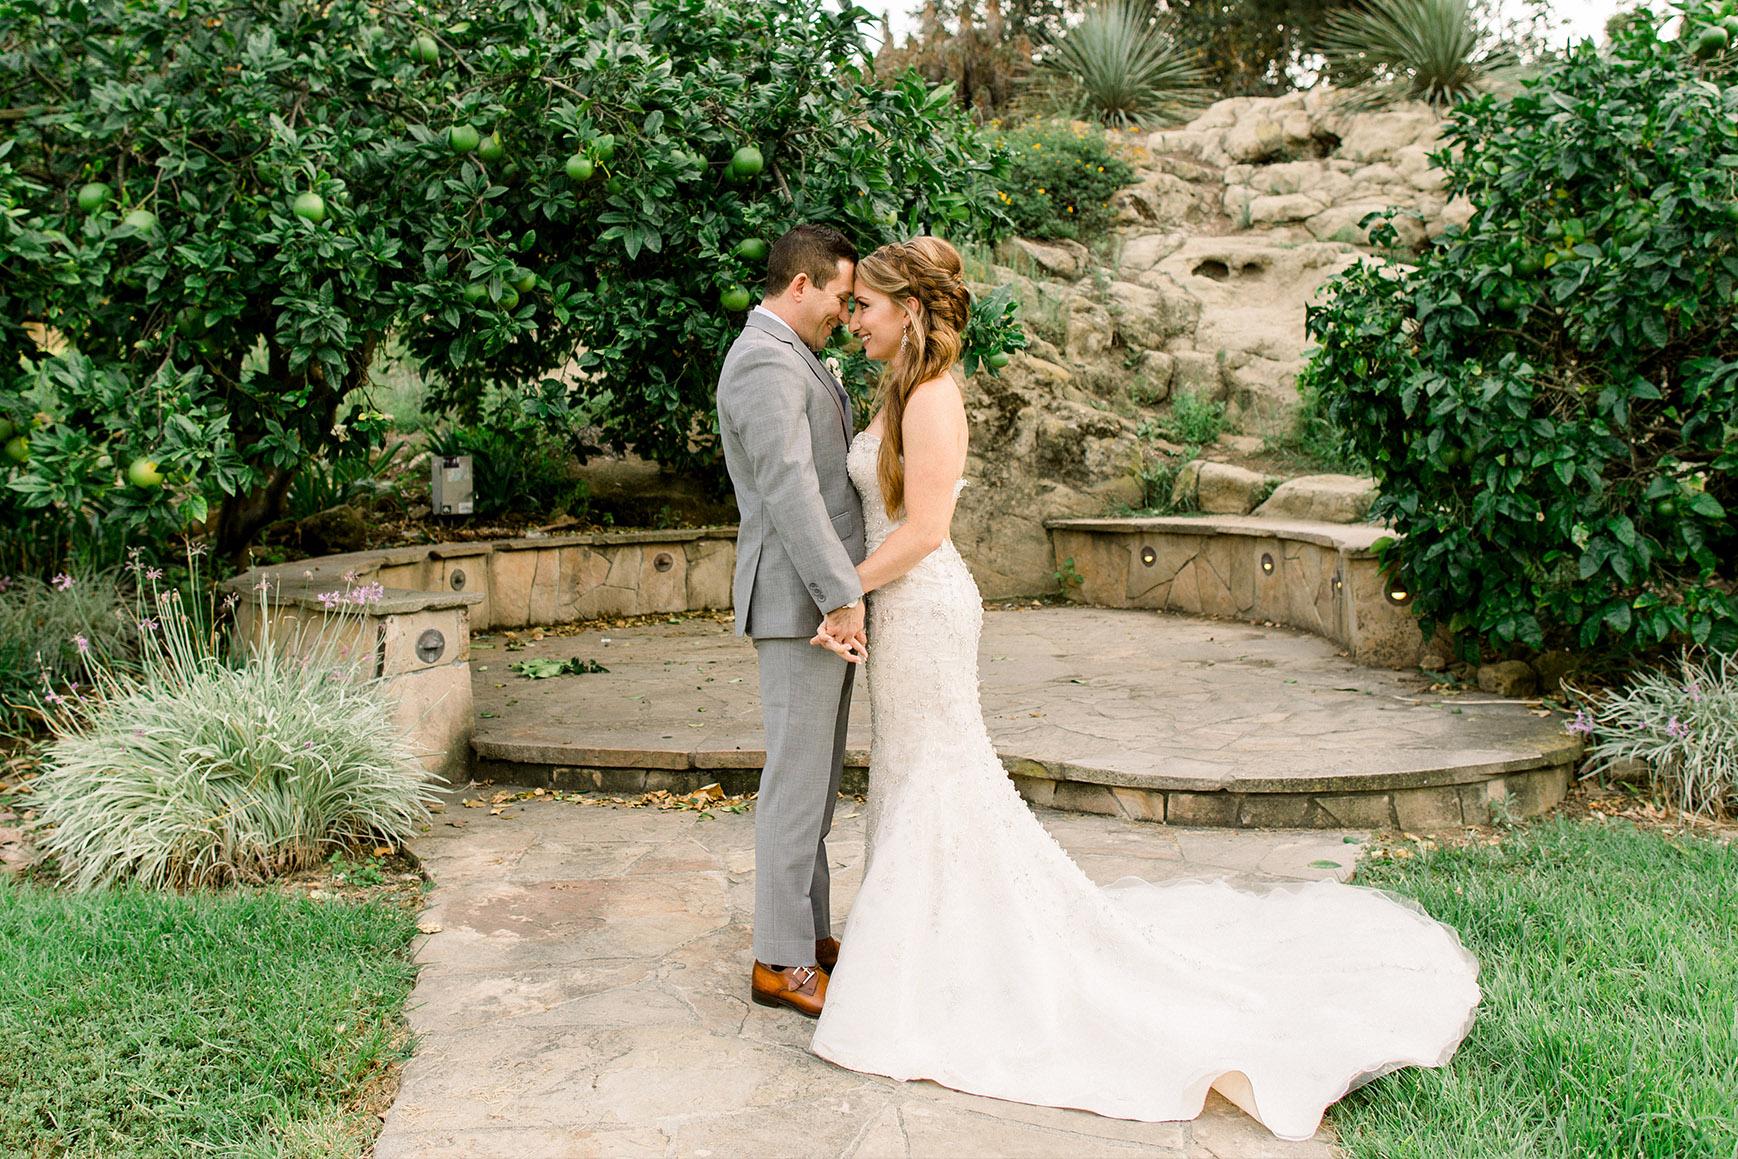 Picturesque moment between a couple -  University Club - Irvine, California - Orange County - Wedgewood Weddings